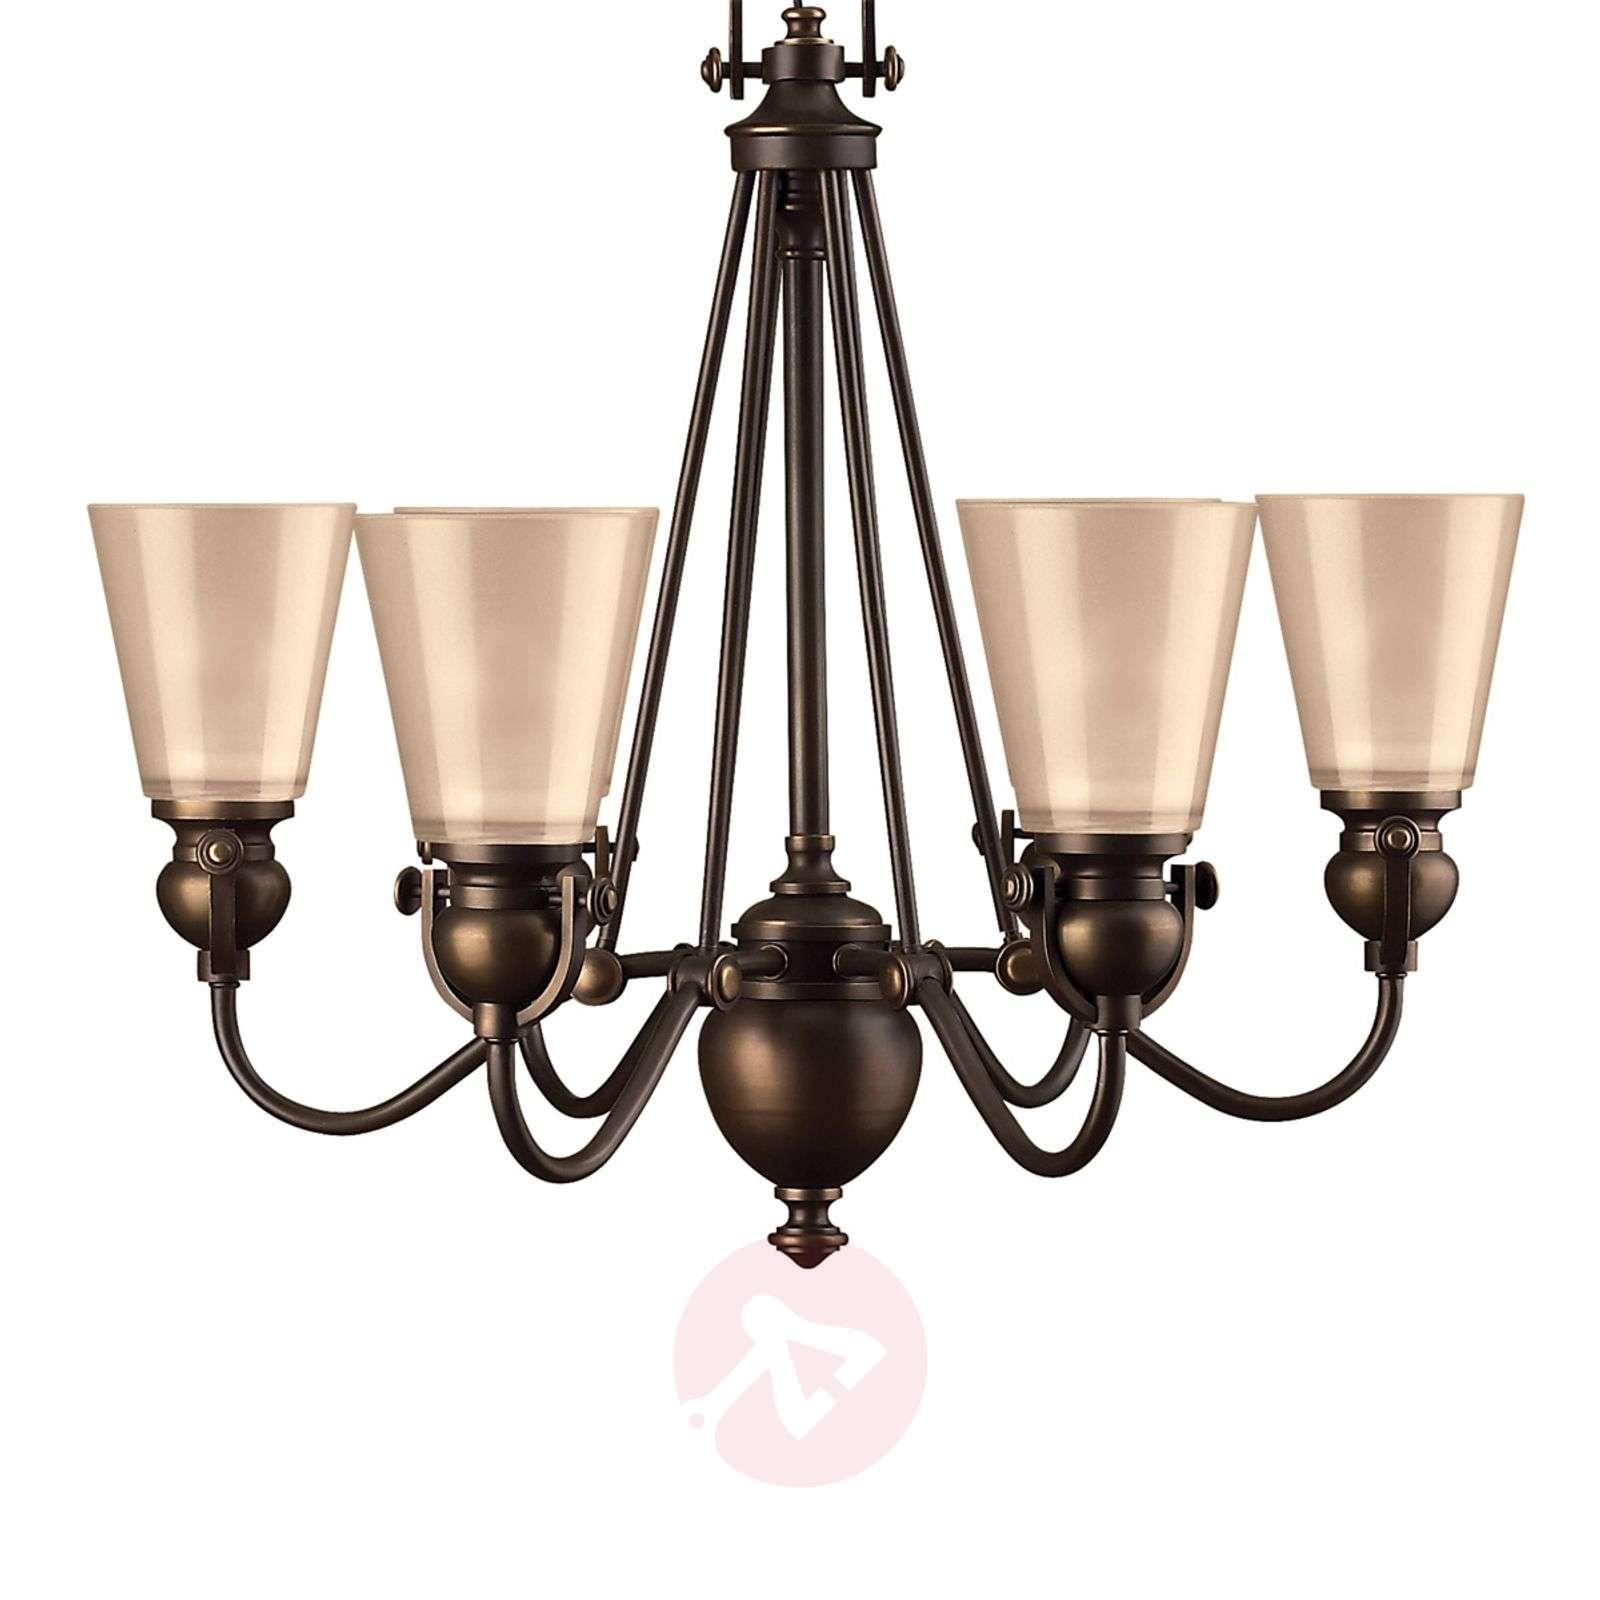 Mayflower Hanging Light Rustic-3048123X-01